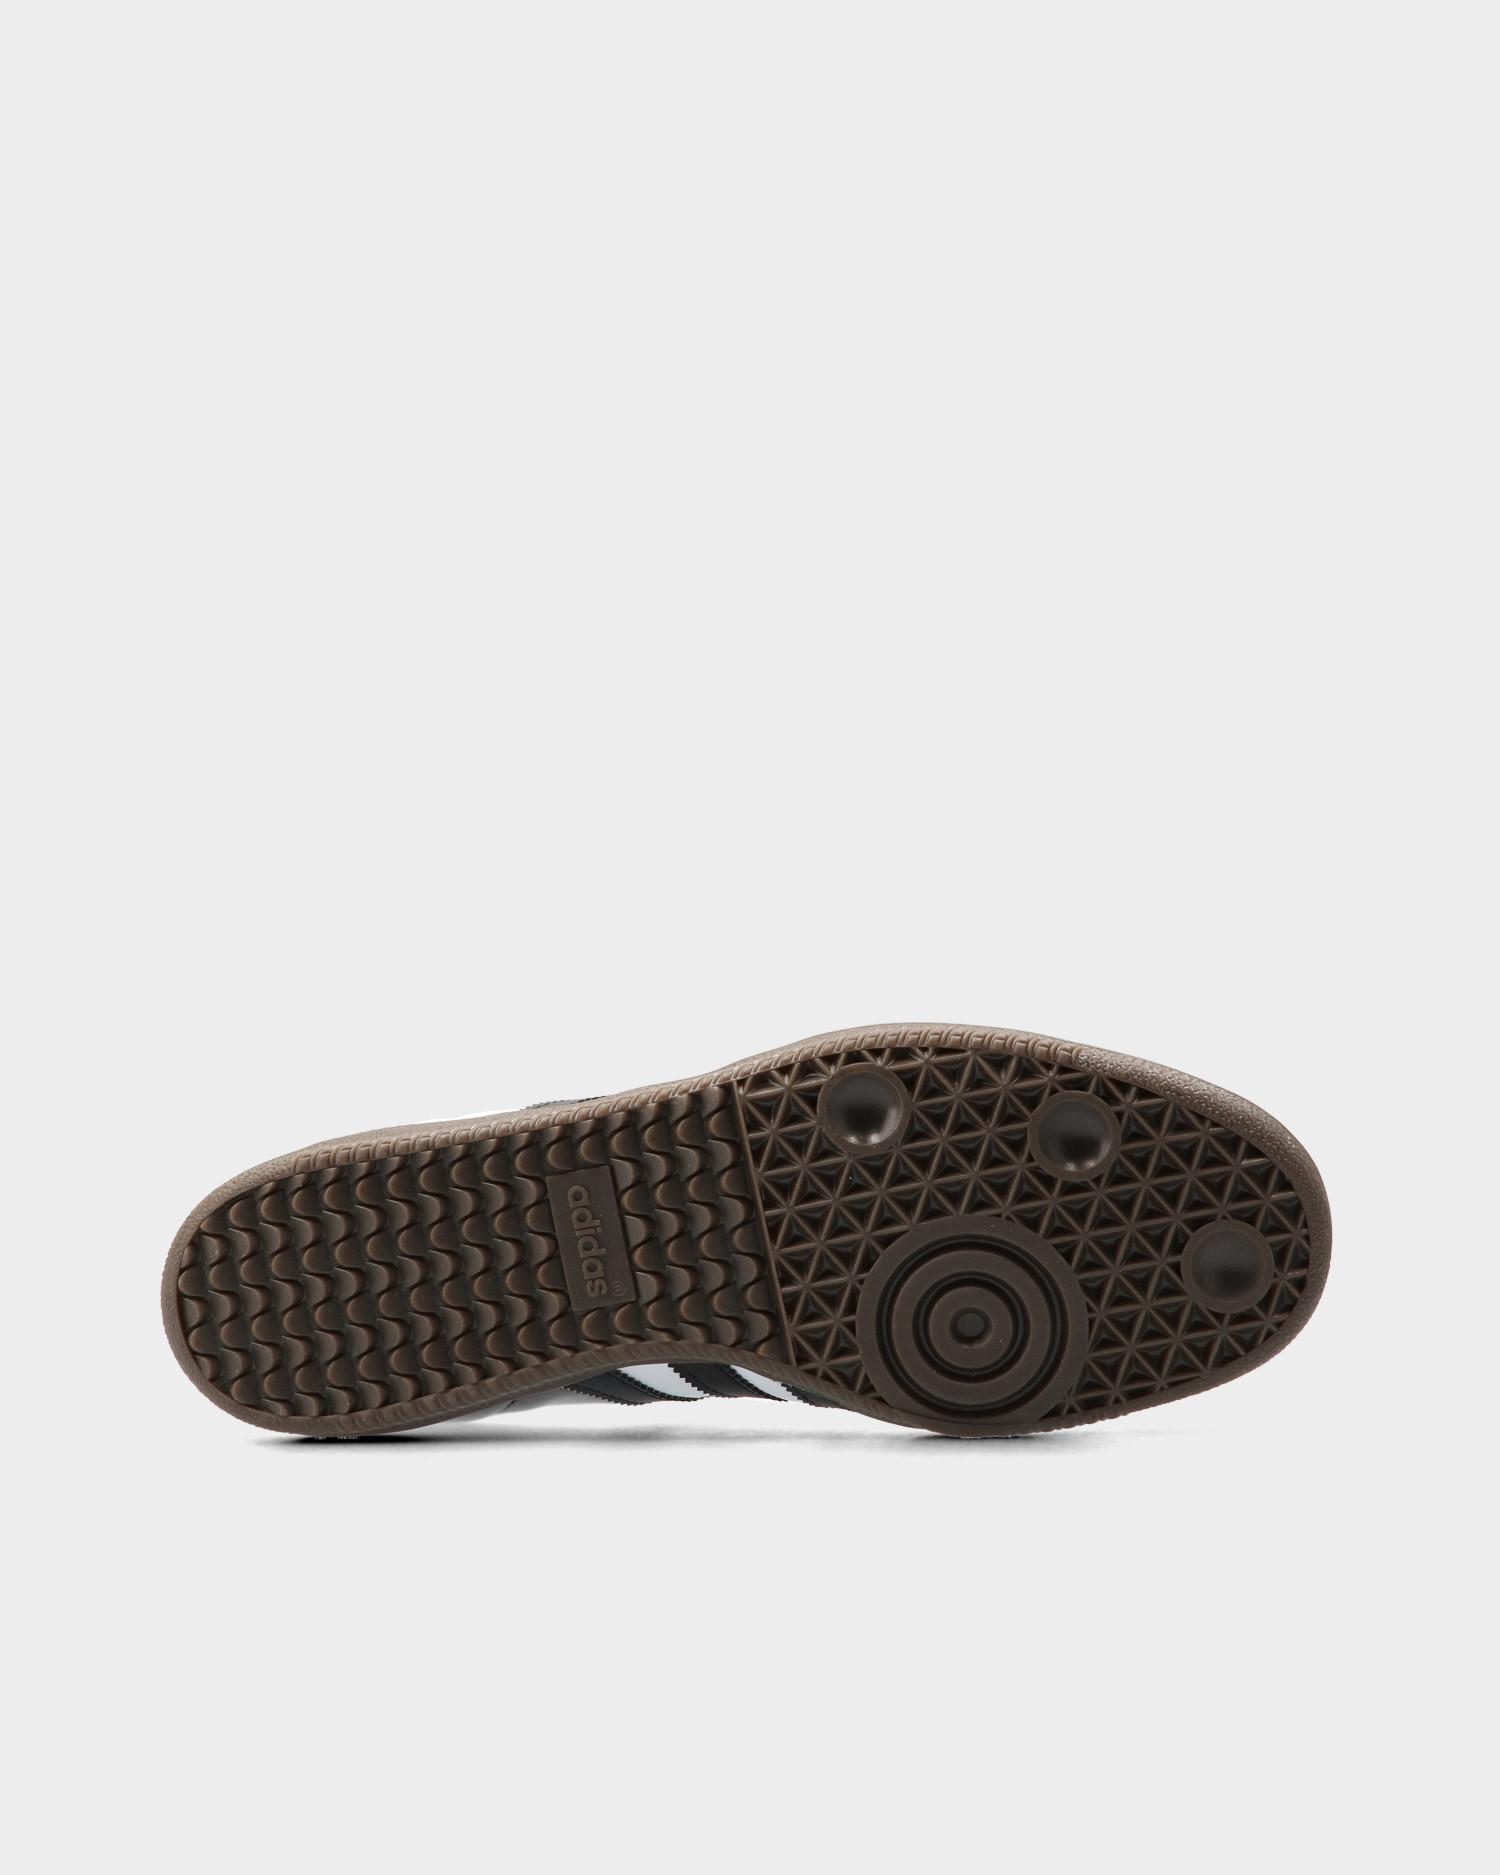 Adidas Skateboarding Samba Adv Ftwwht/Black/Gum5